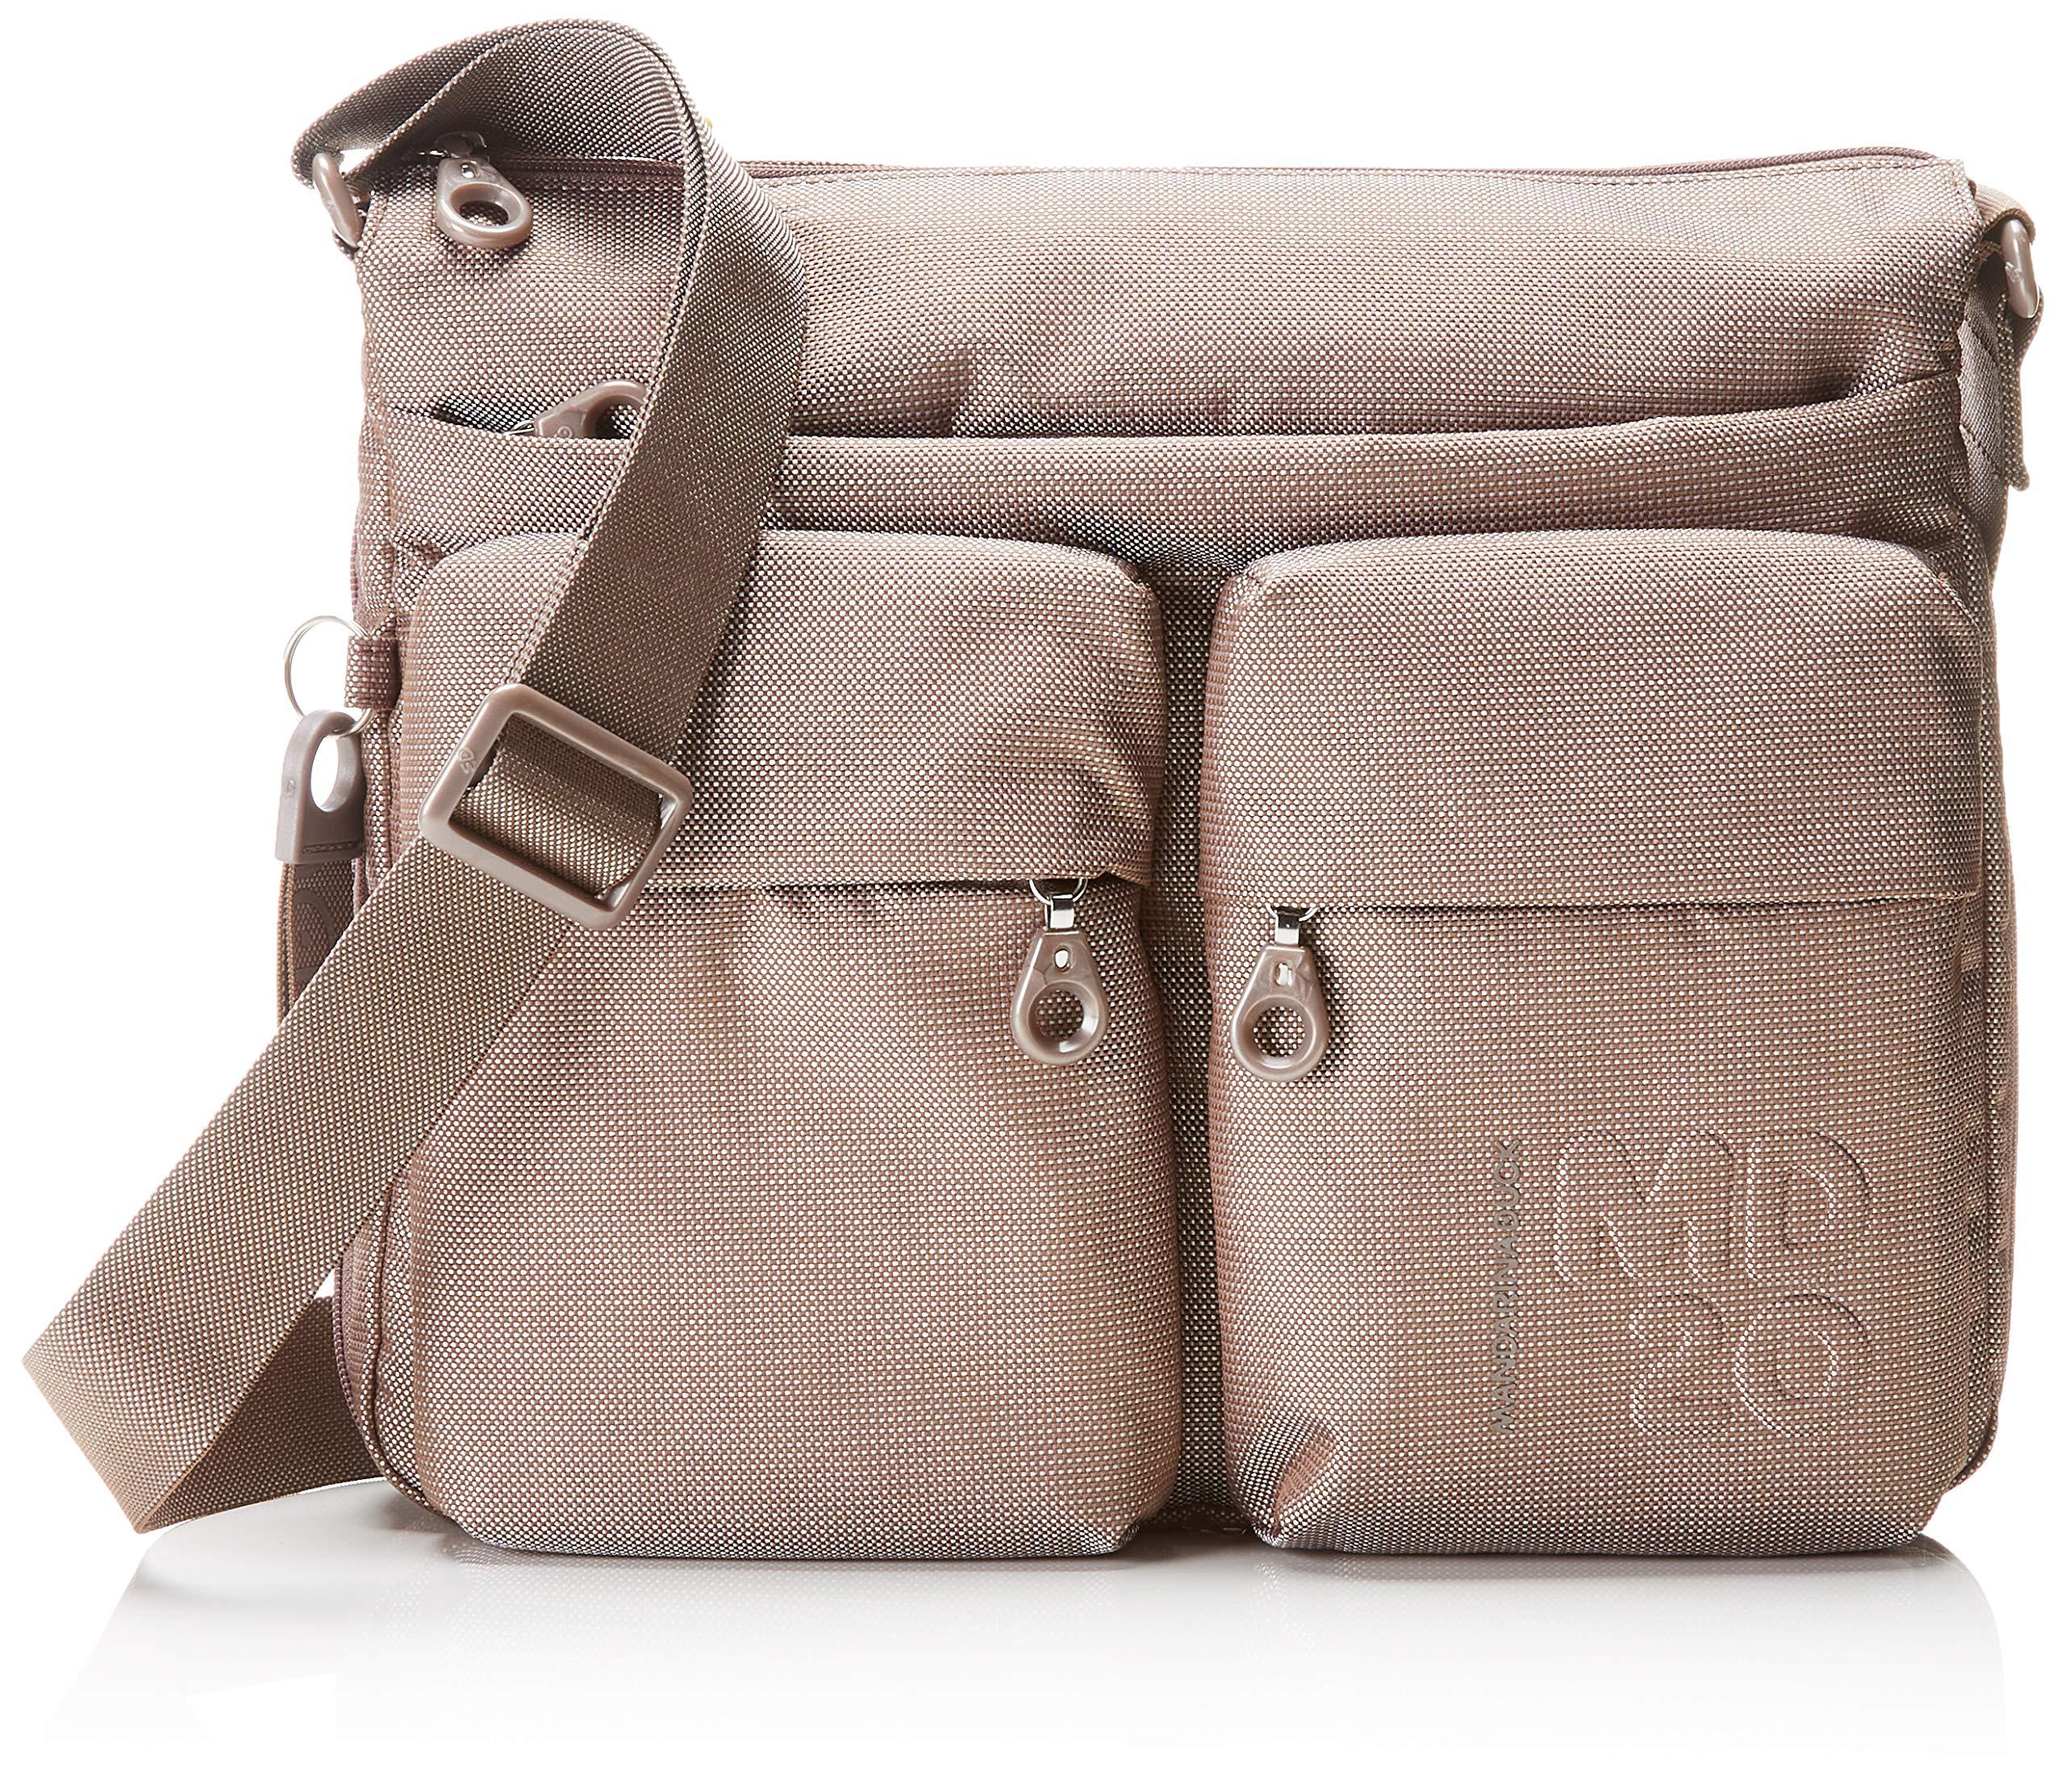 Mandarina Duck Handtaschen Taschen QMTX6_09K taupe Taupe z8NEY